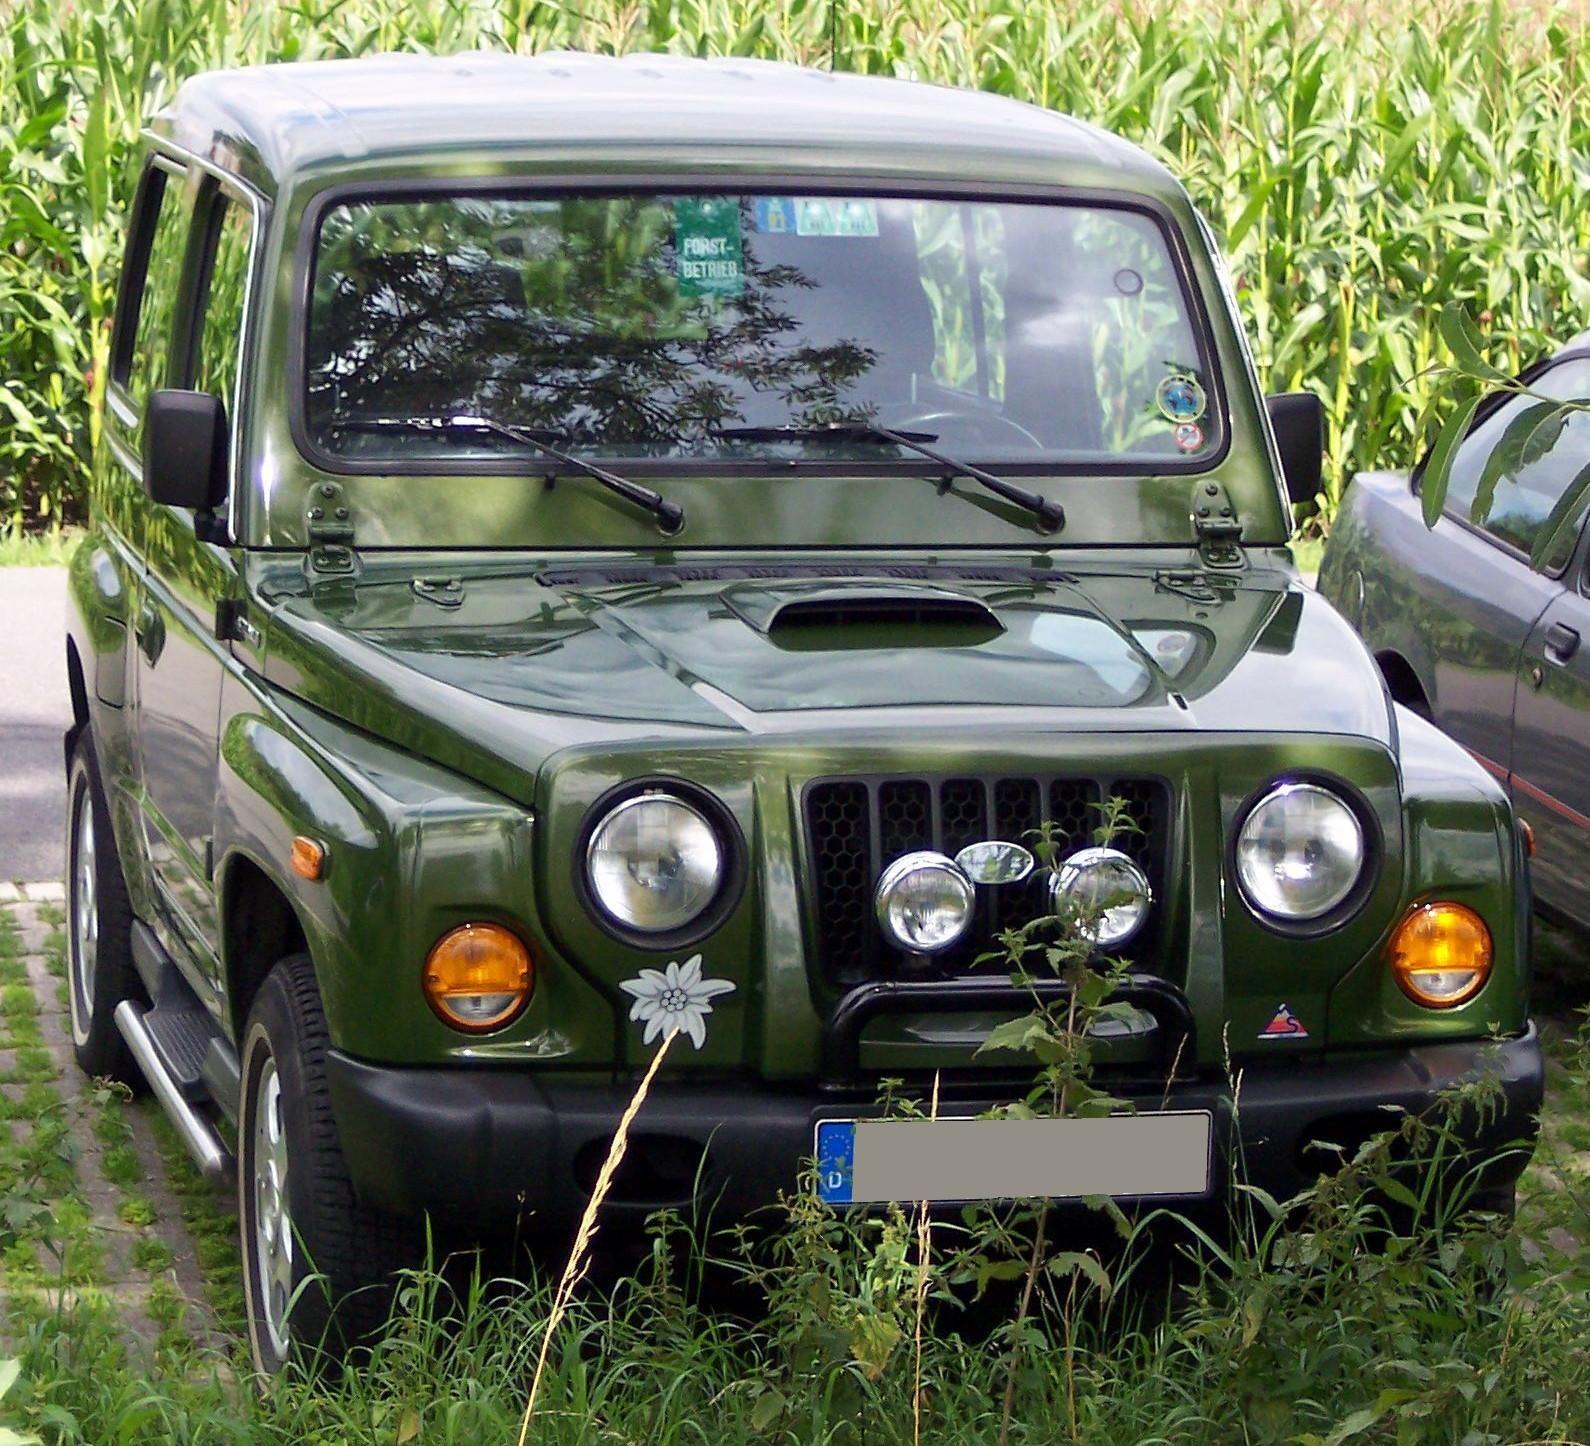 Kia Car Wallpaper: Military Jeep, Small